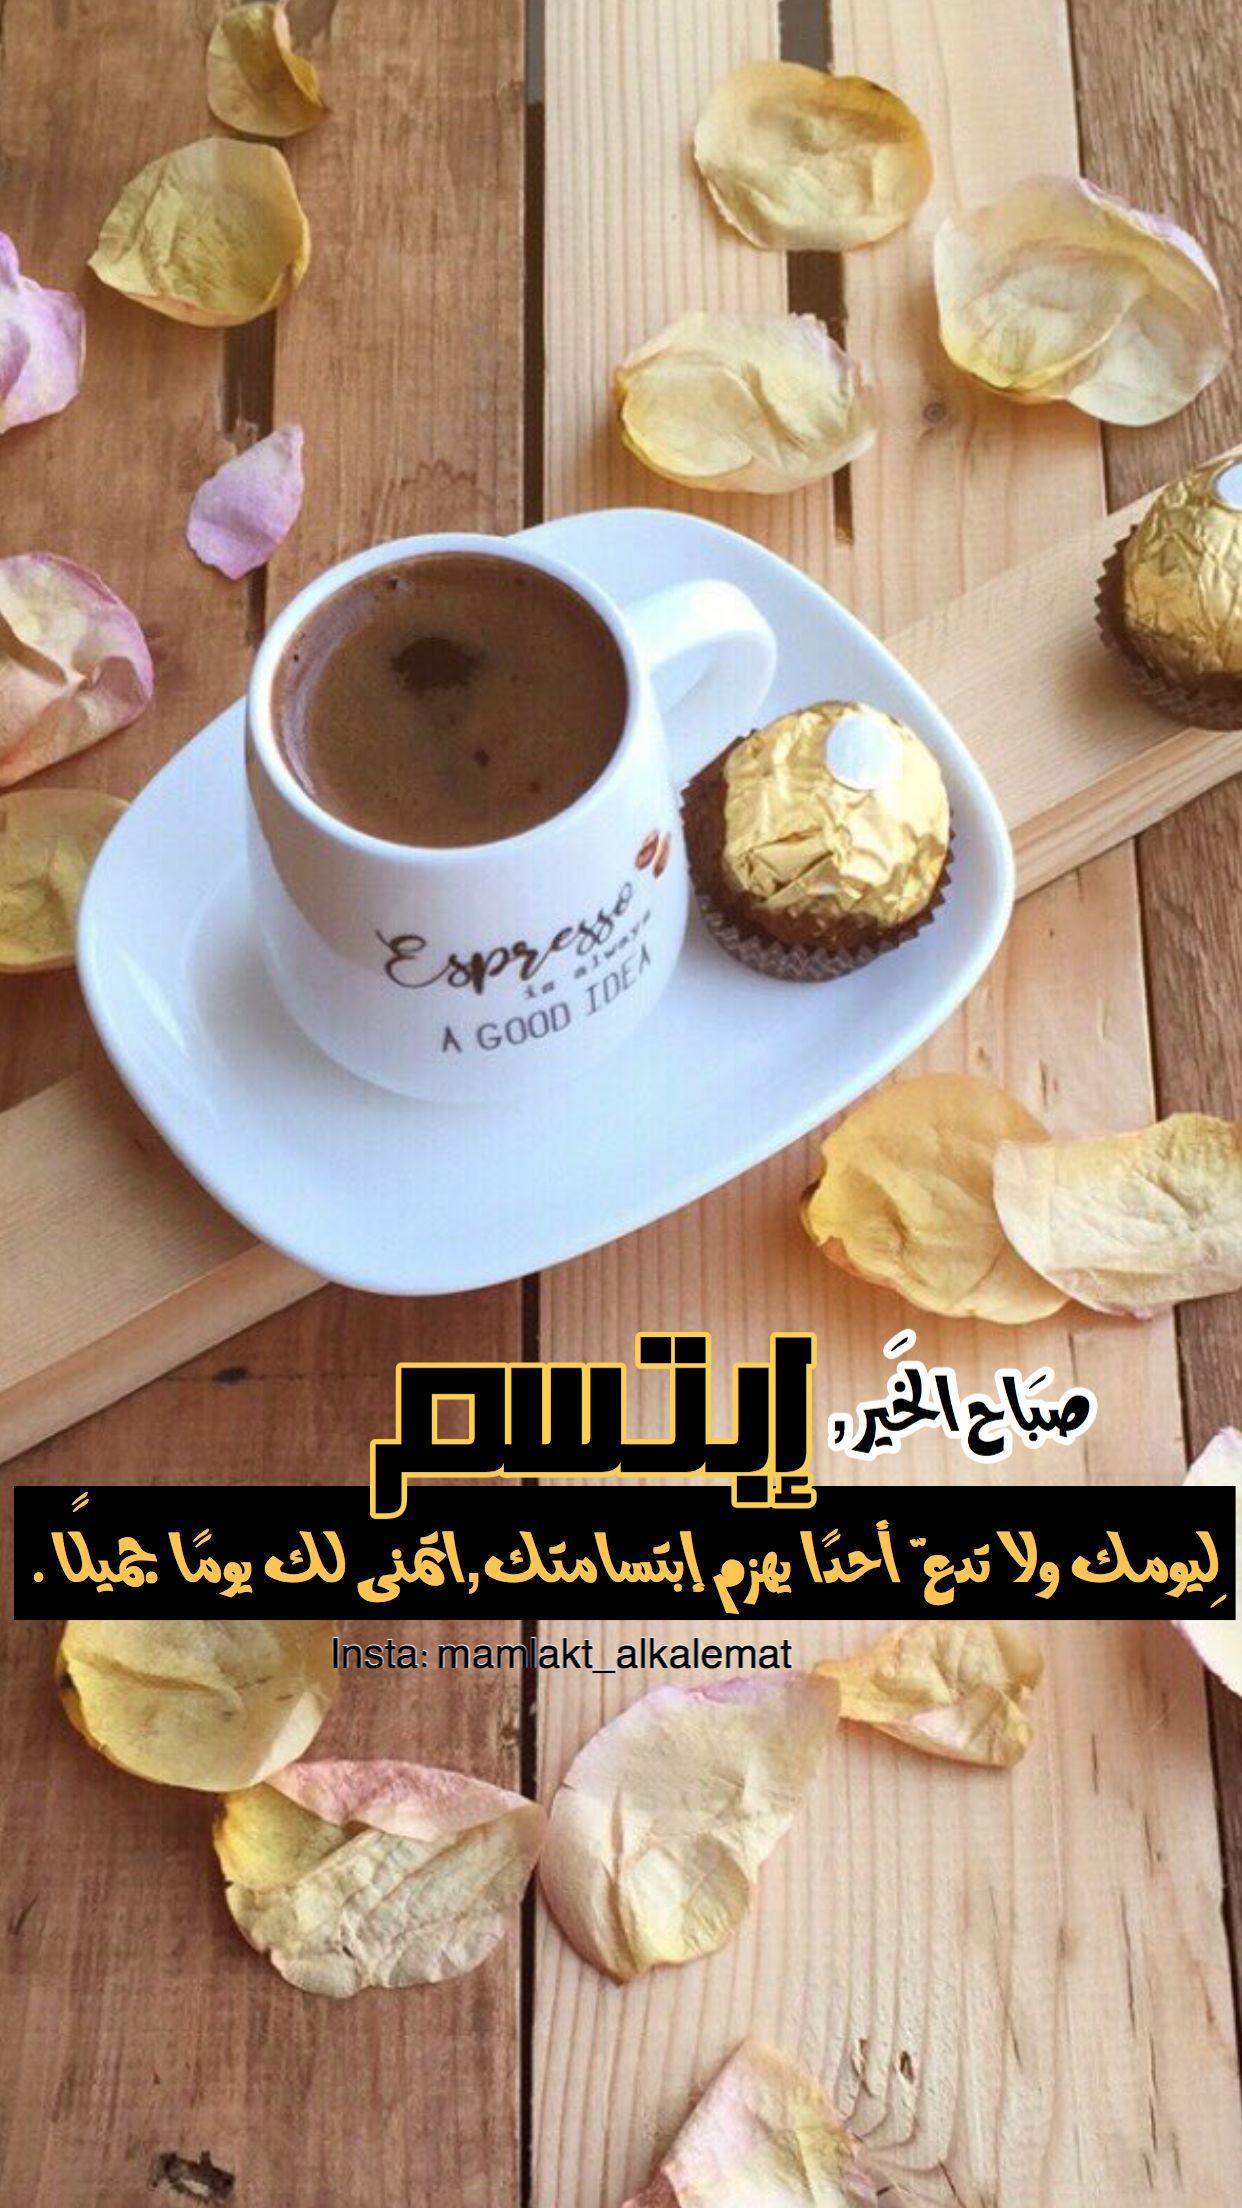 Pin By Abeer Badr On صباح الخير صباح الورد Good Morning Coffee Morning Love Quotes Morning Coffee